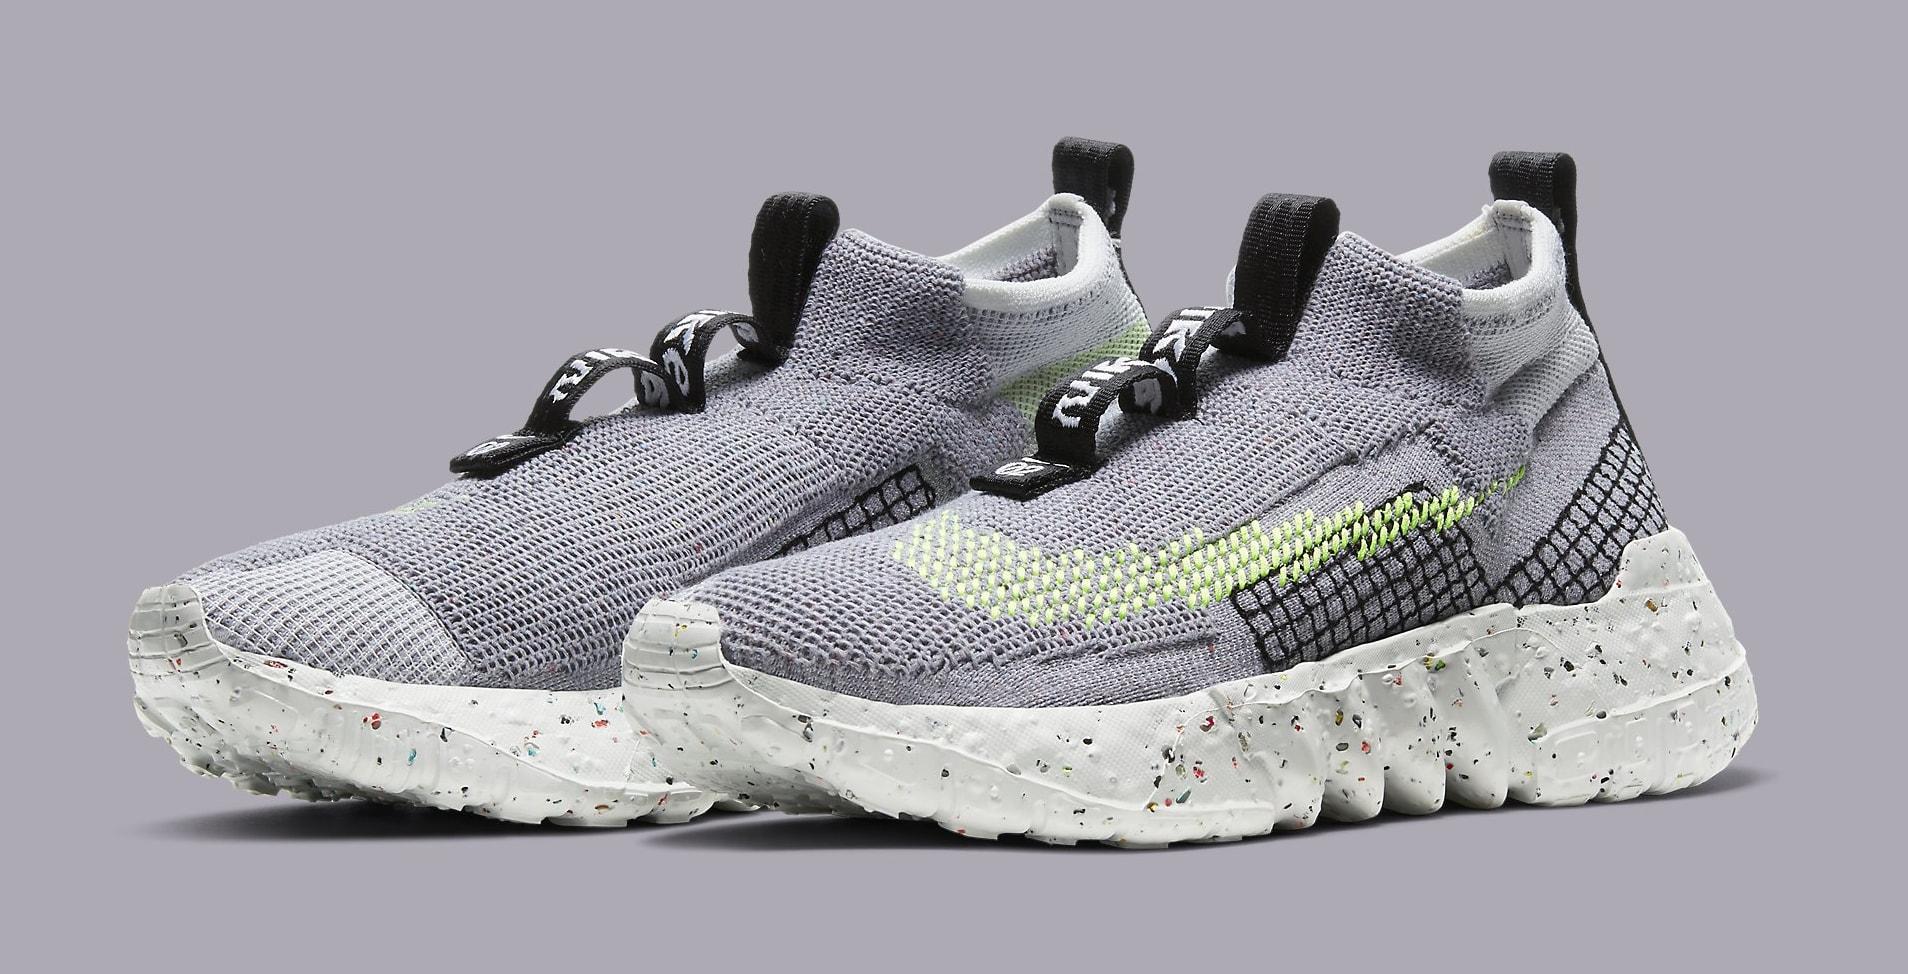 Nike Space Hippie 02 'Grey/Volt' CQ3988-002 Pair